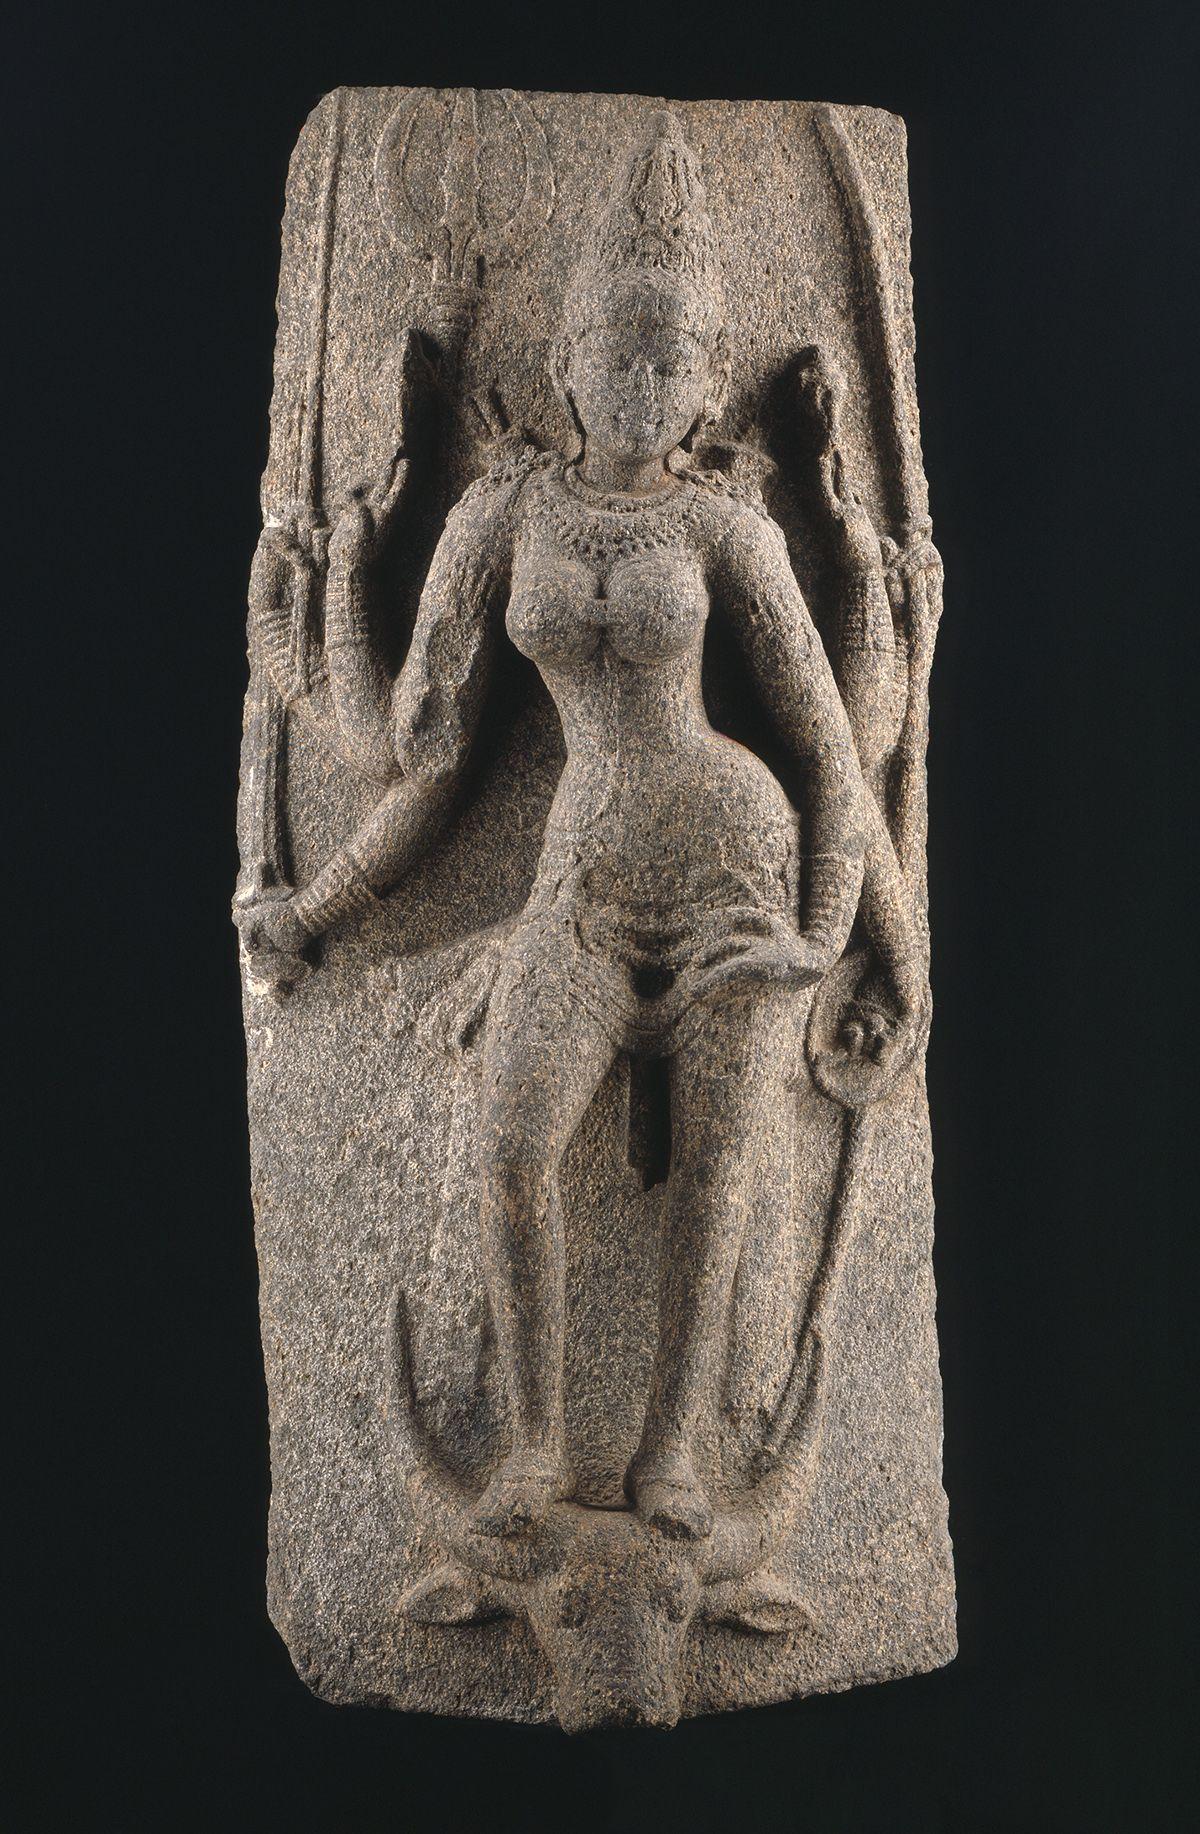 Mahishasuramardini Durga, Pallava art from Tamil Nadu